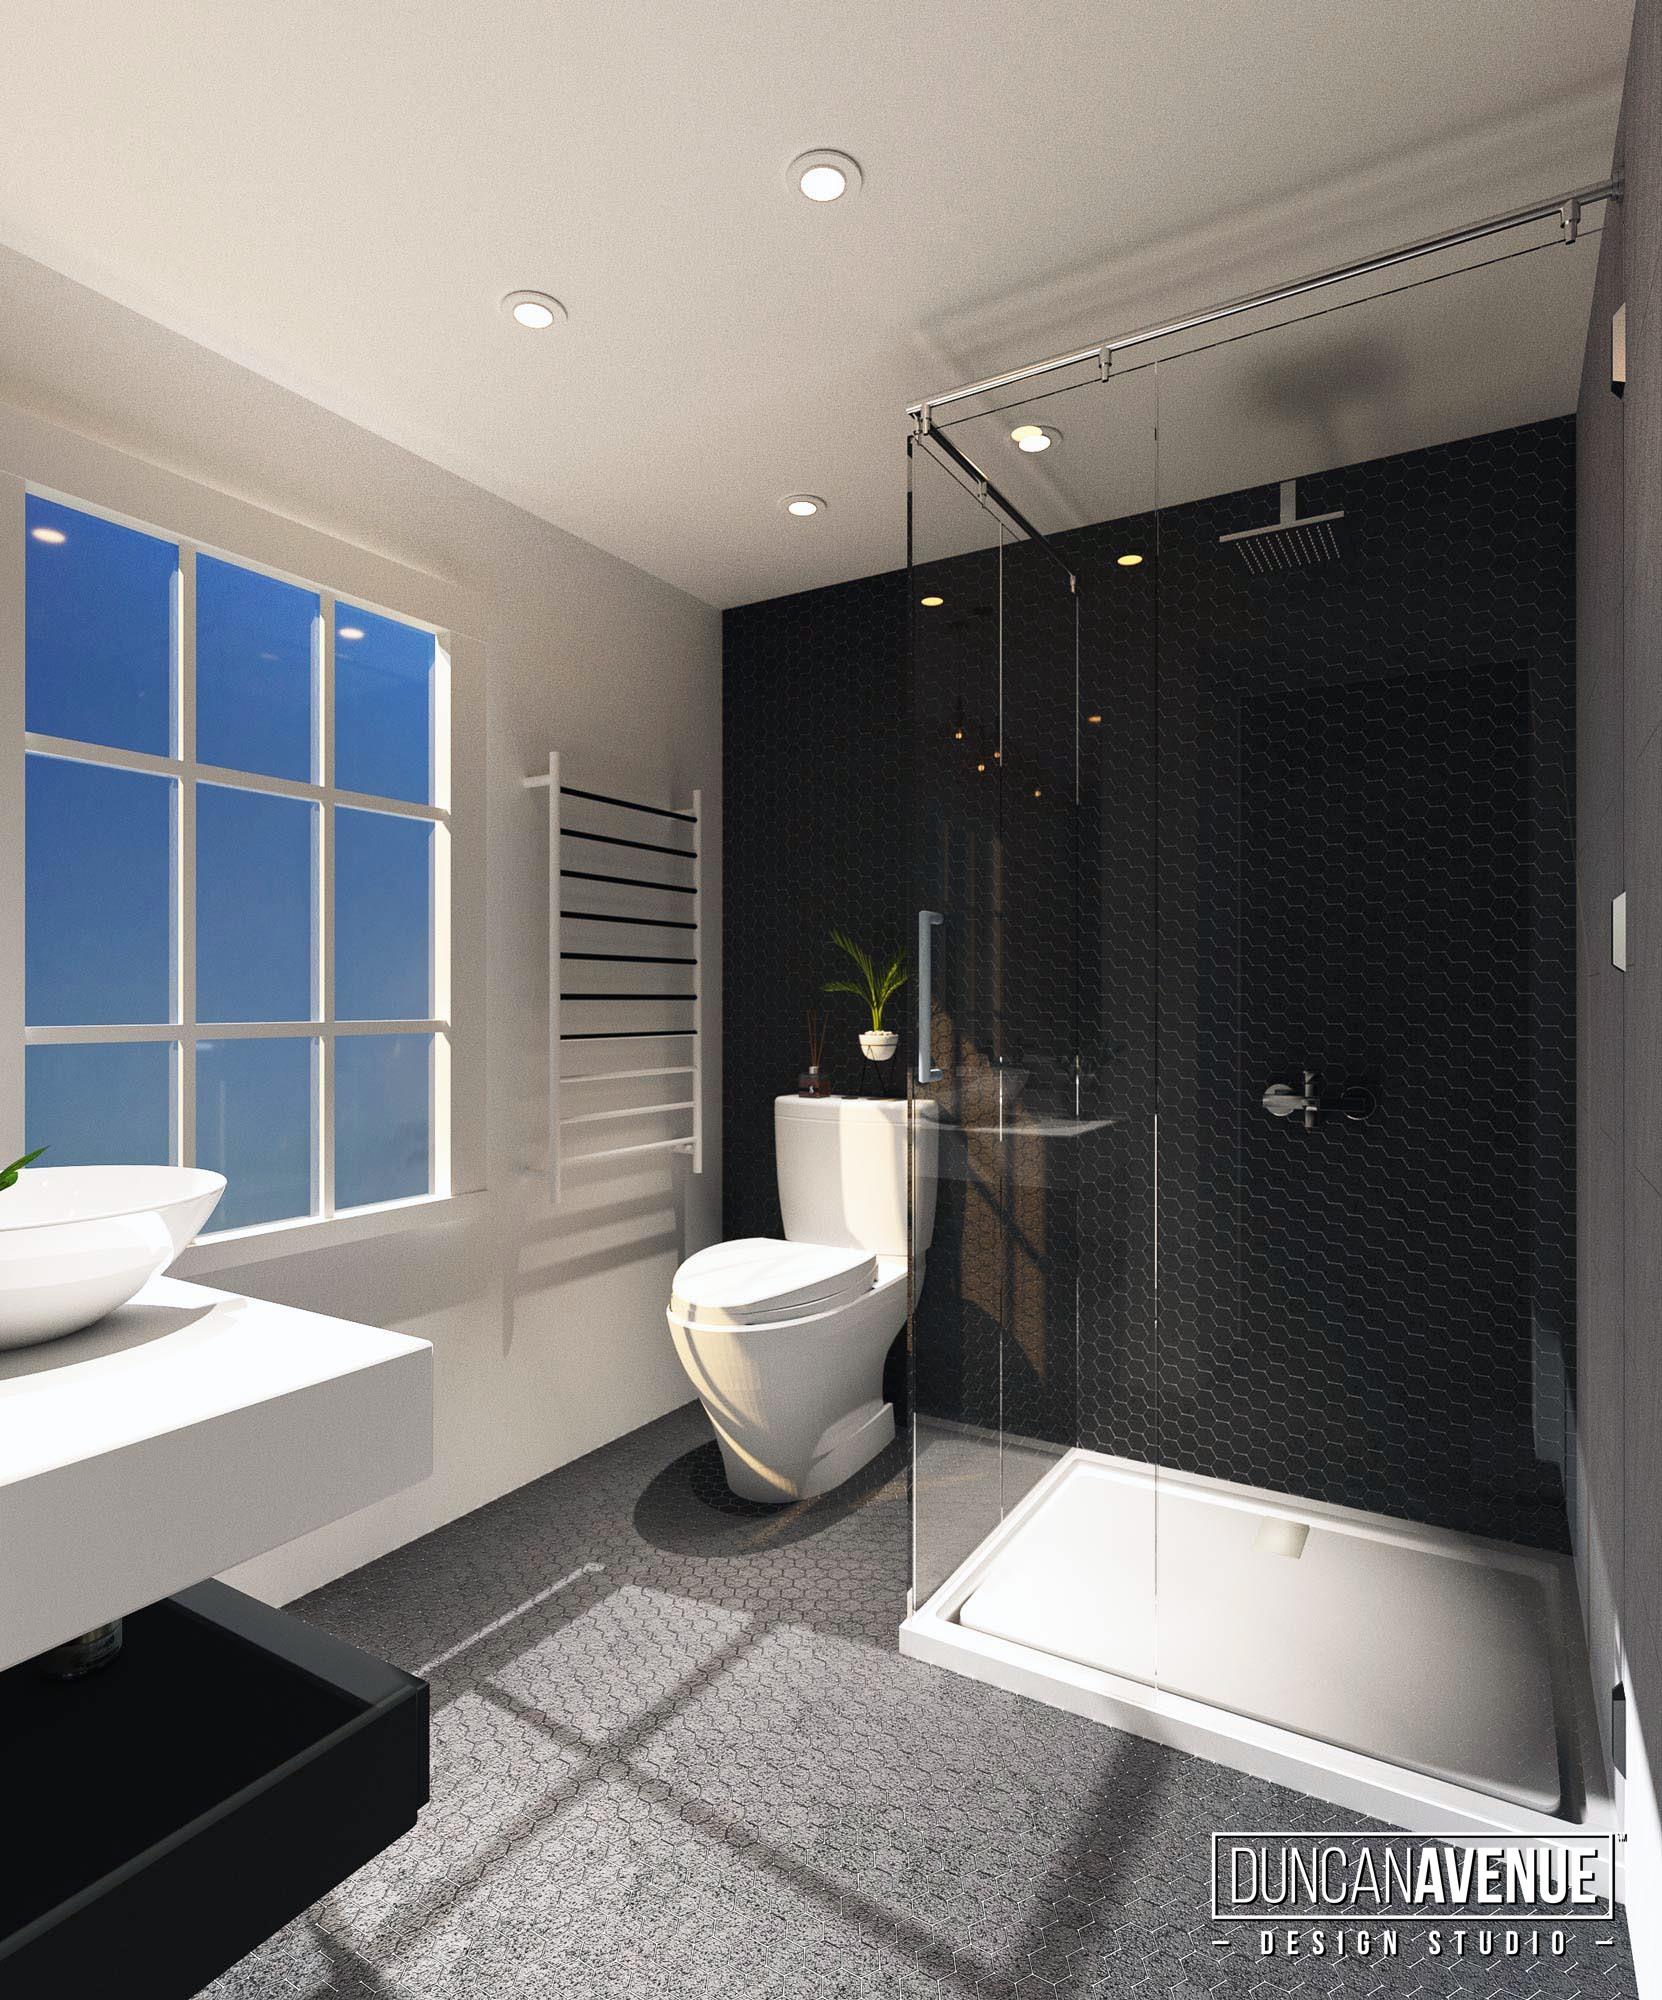 Modern Rustic Kitchen and Bathroom Interior Design Project in Cornwall on Hudson, NY Designer: Maxwell L. Alexander // Duncan Avenue Interior Design Studio / Hudson Valley